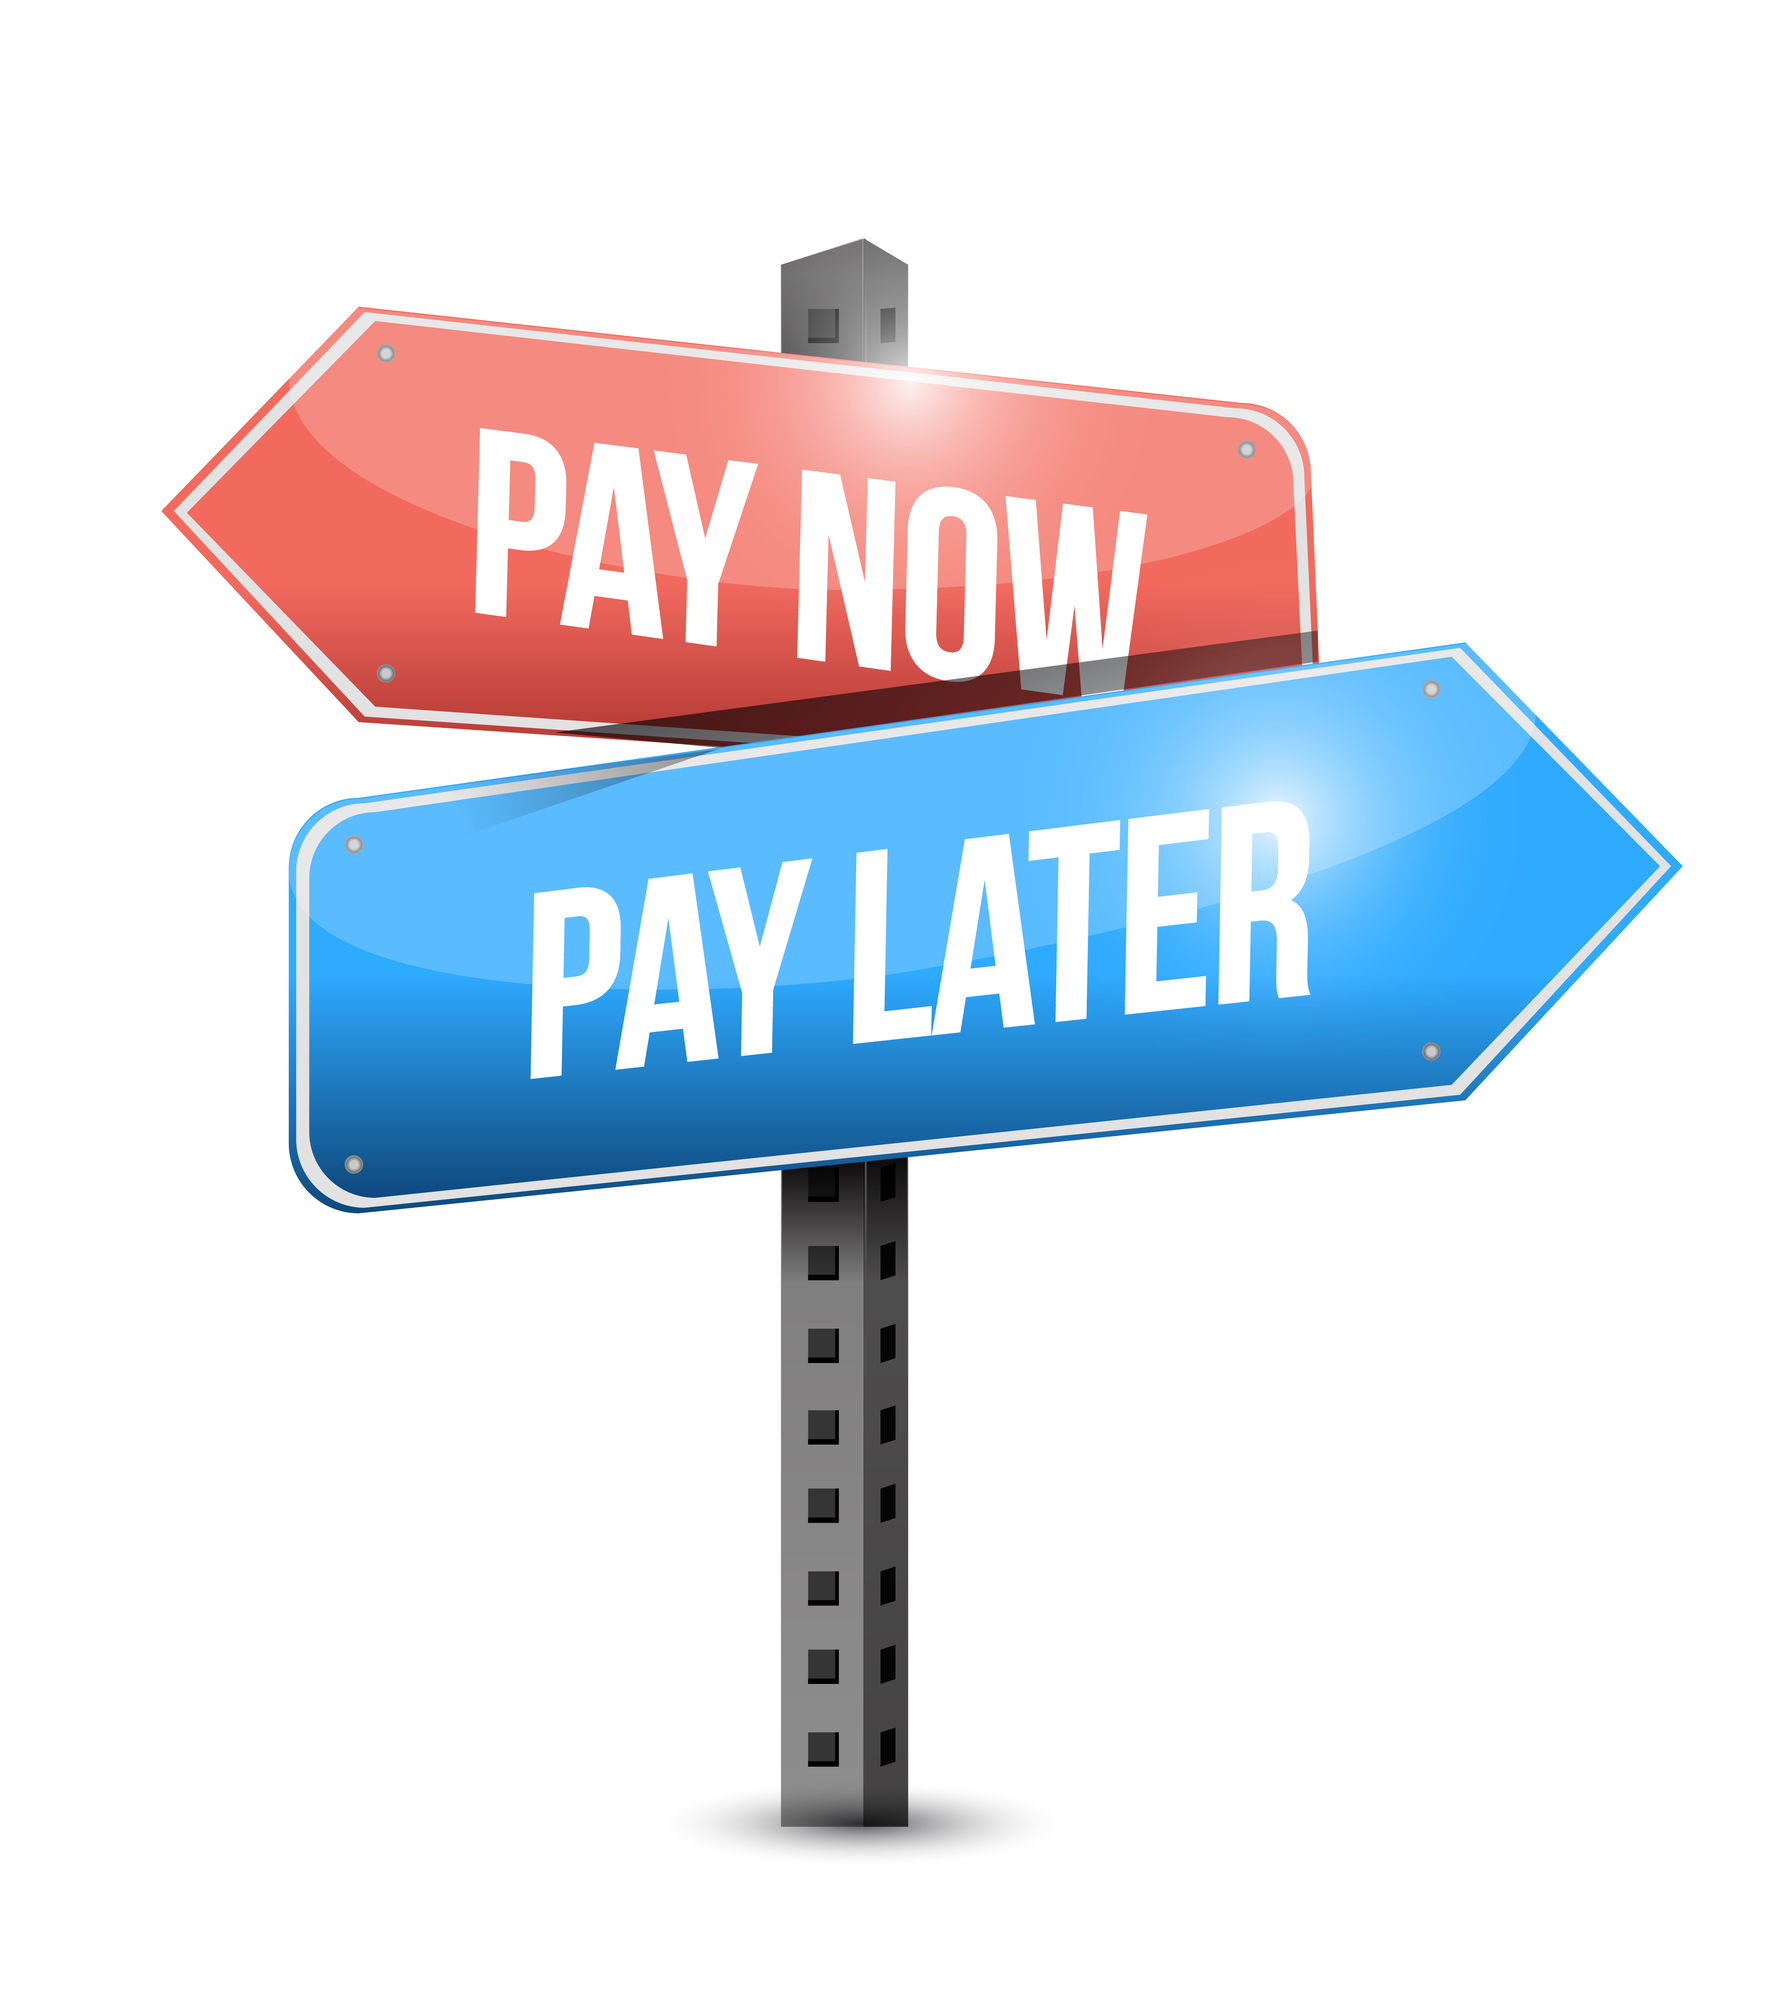 Achteraf betalen